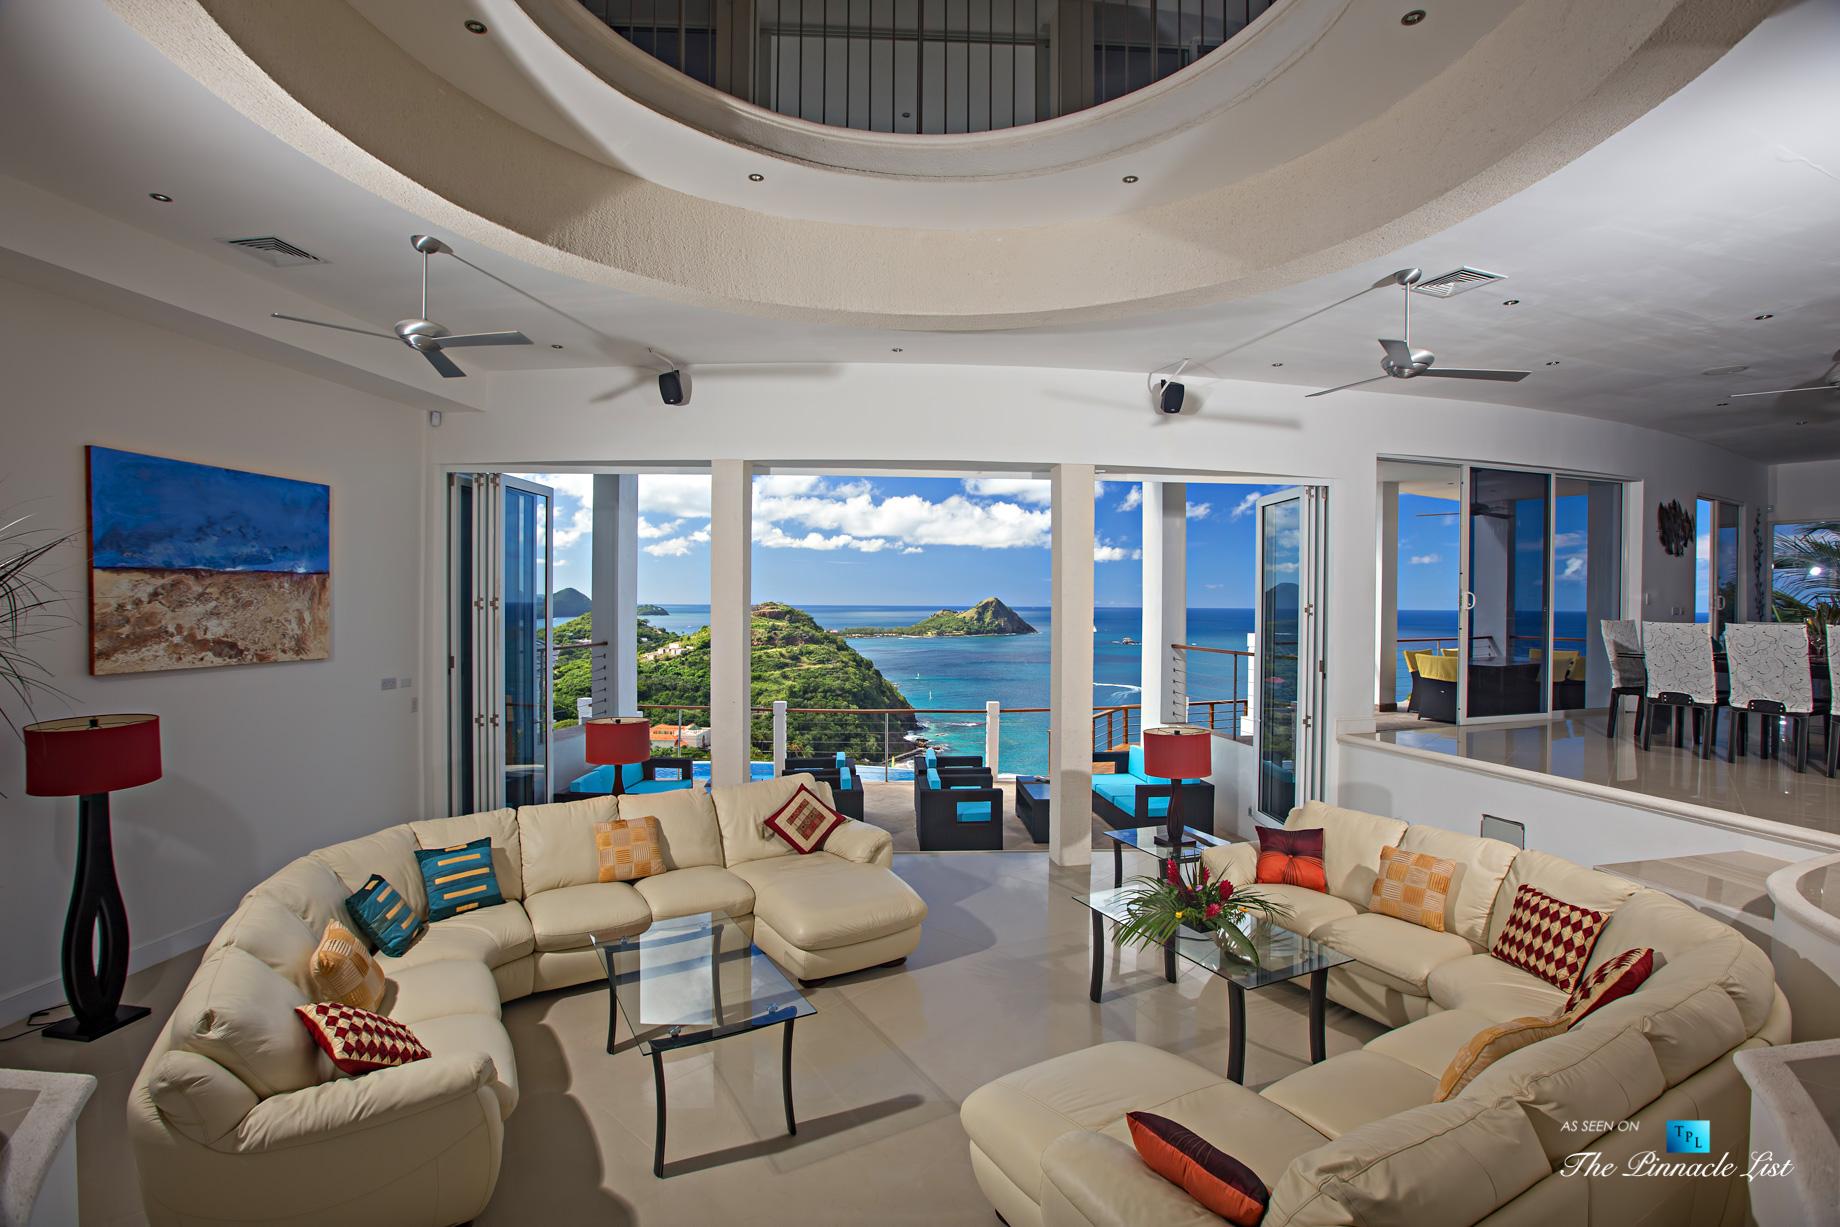 Akasha Luxury Caribbean Villa - Cap Estate, St. Lucia - Living Room View Overlooking Infinity Pool - Luxury Real Estate - Premier Oceanview Home